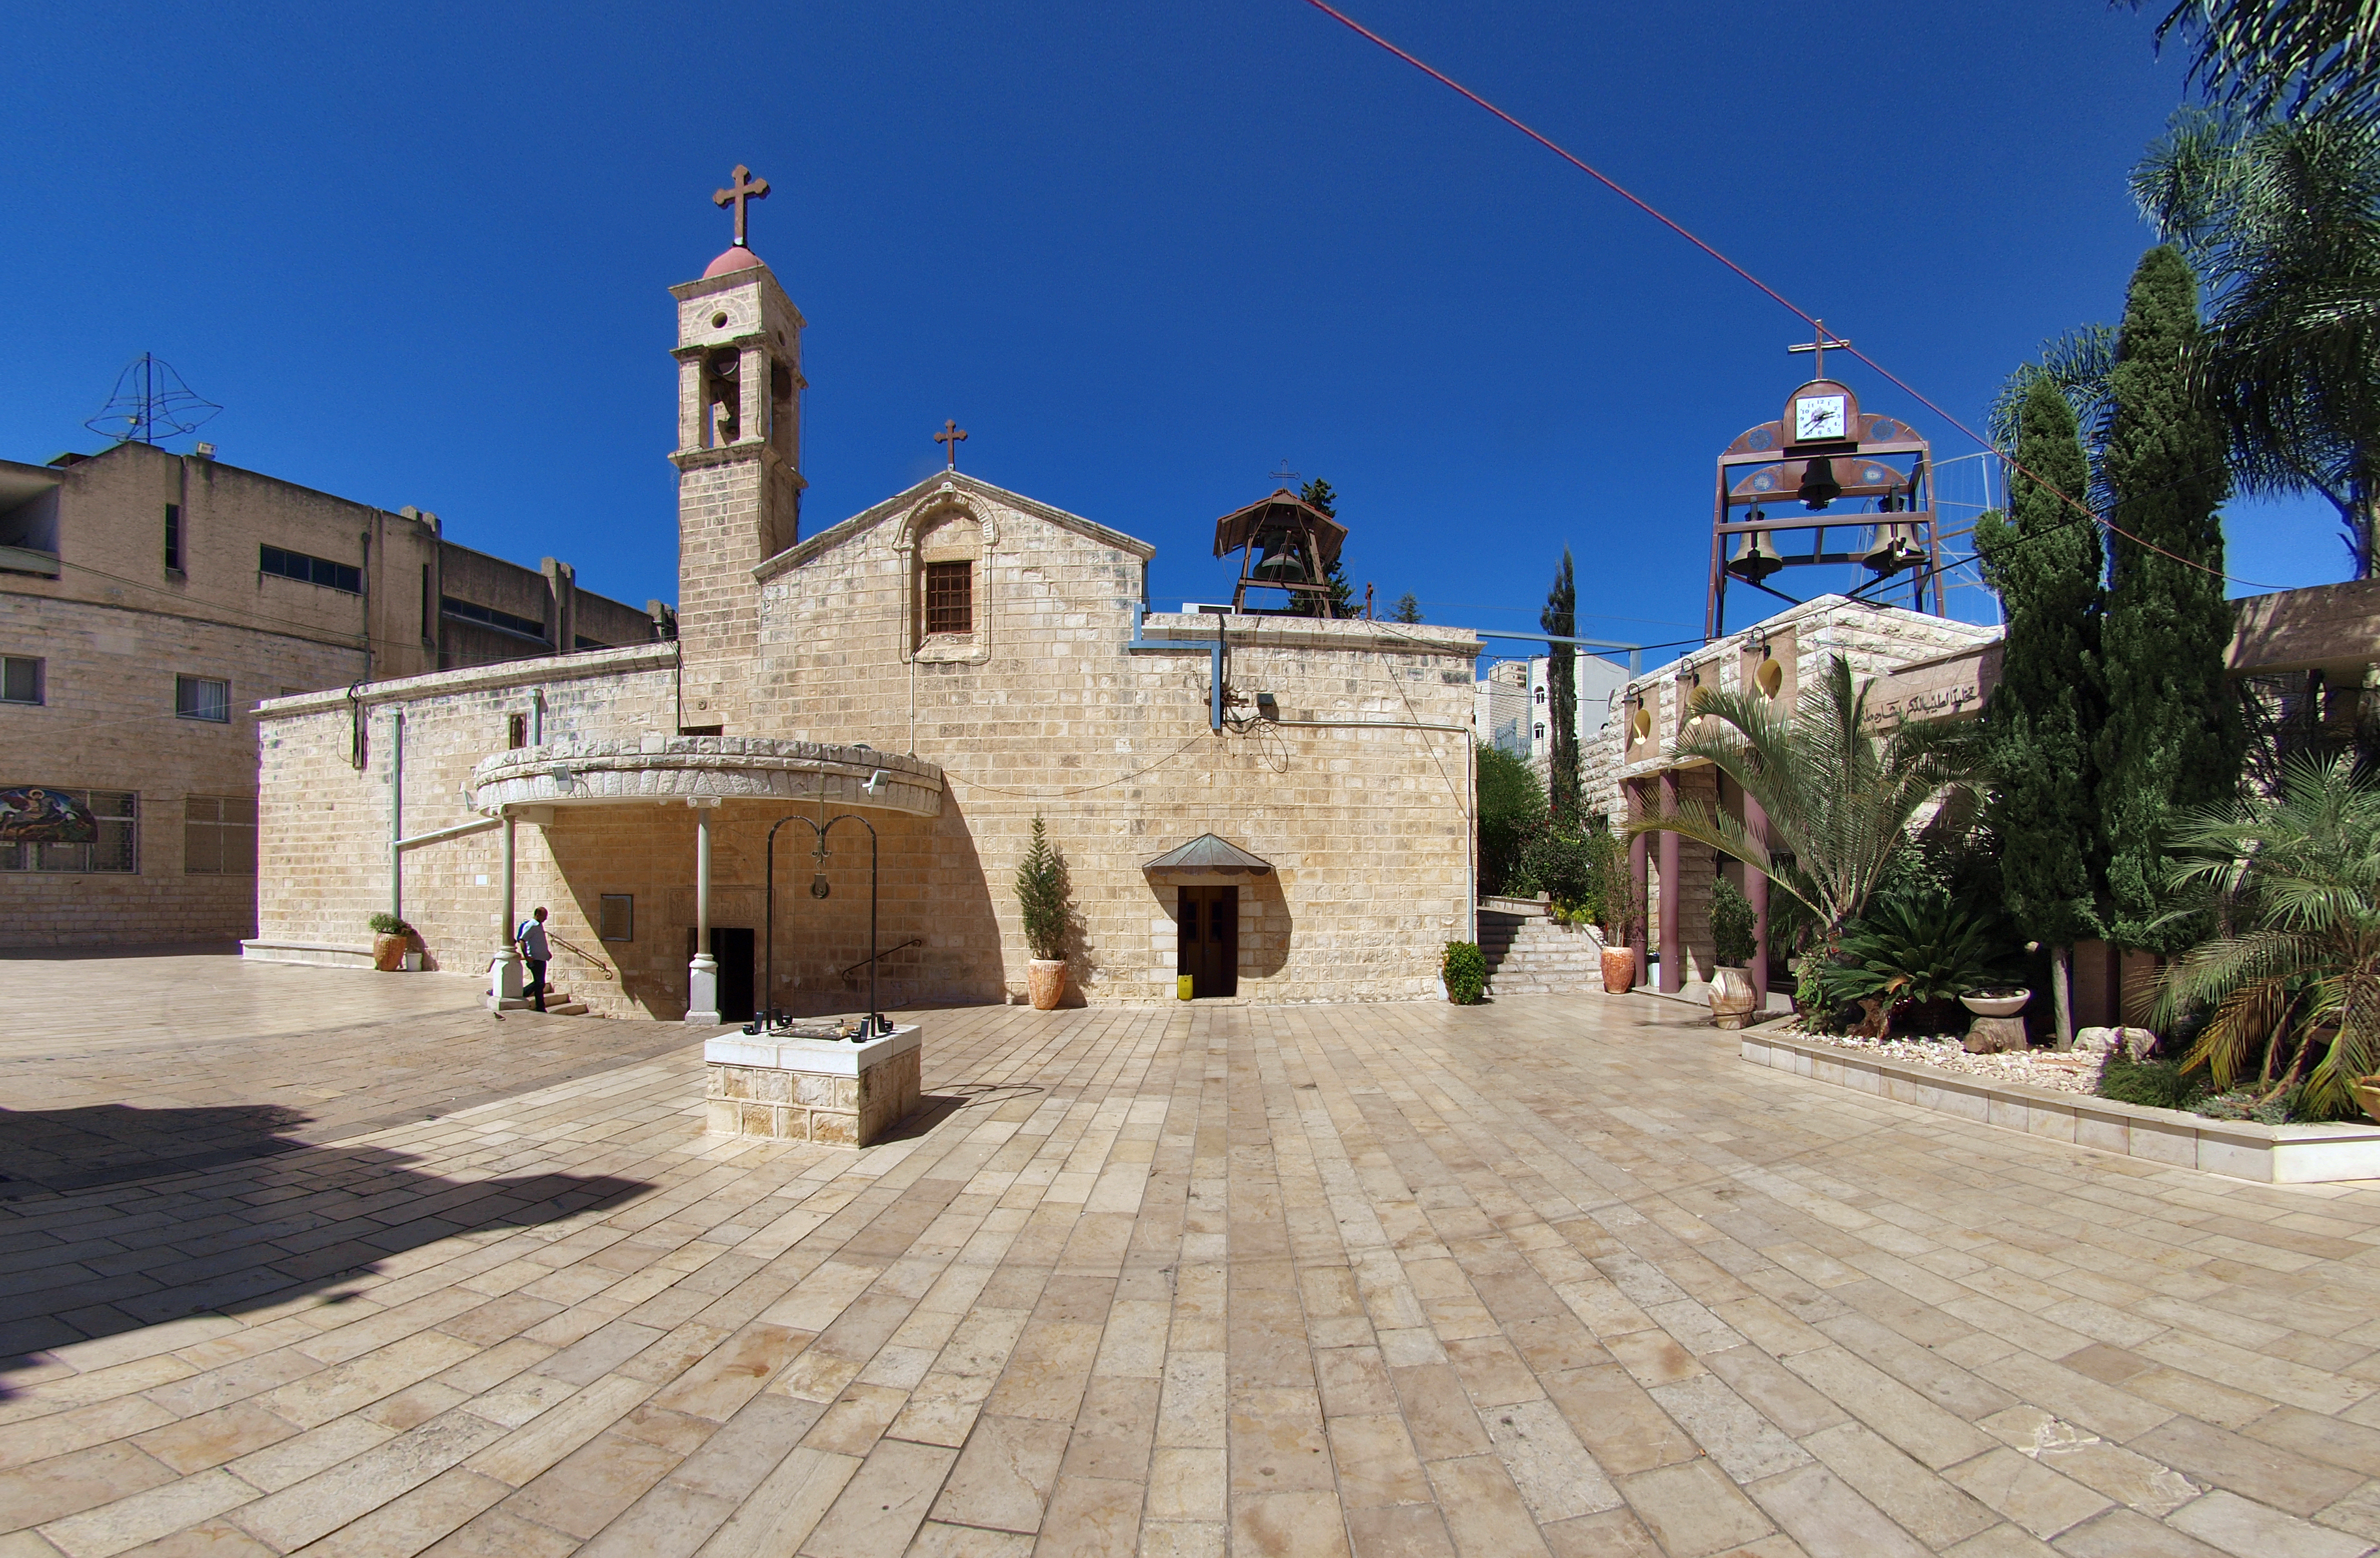 Nazareth Israel  City new picture : ... :Greek Orthodox Church of the Annunciation, Nazareth, Israel. 05